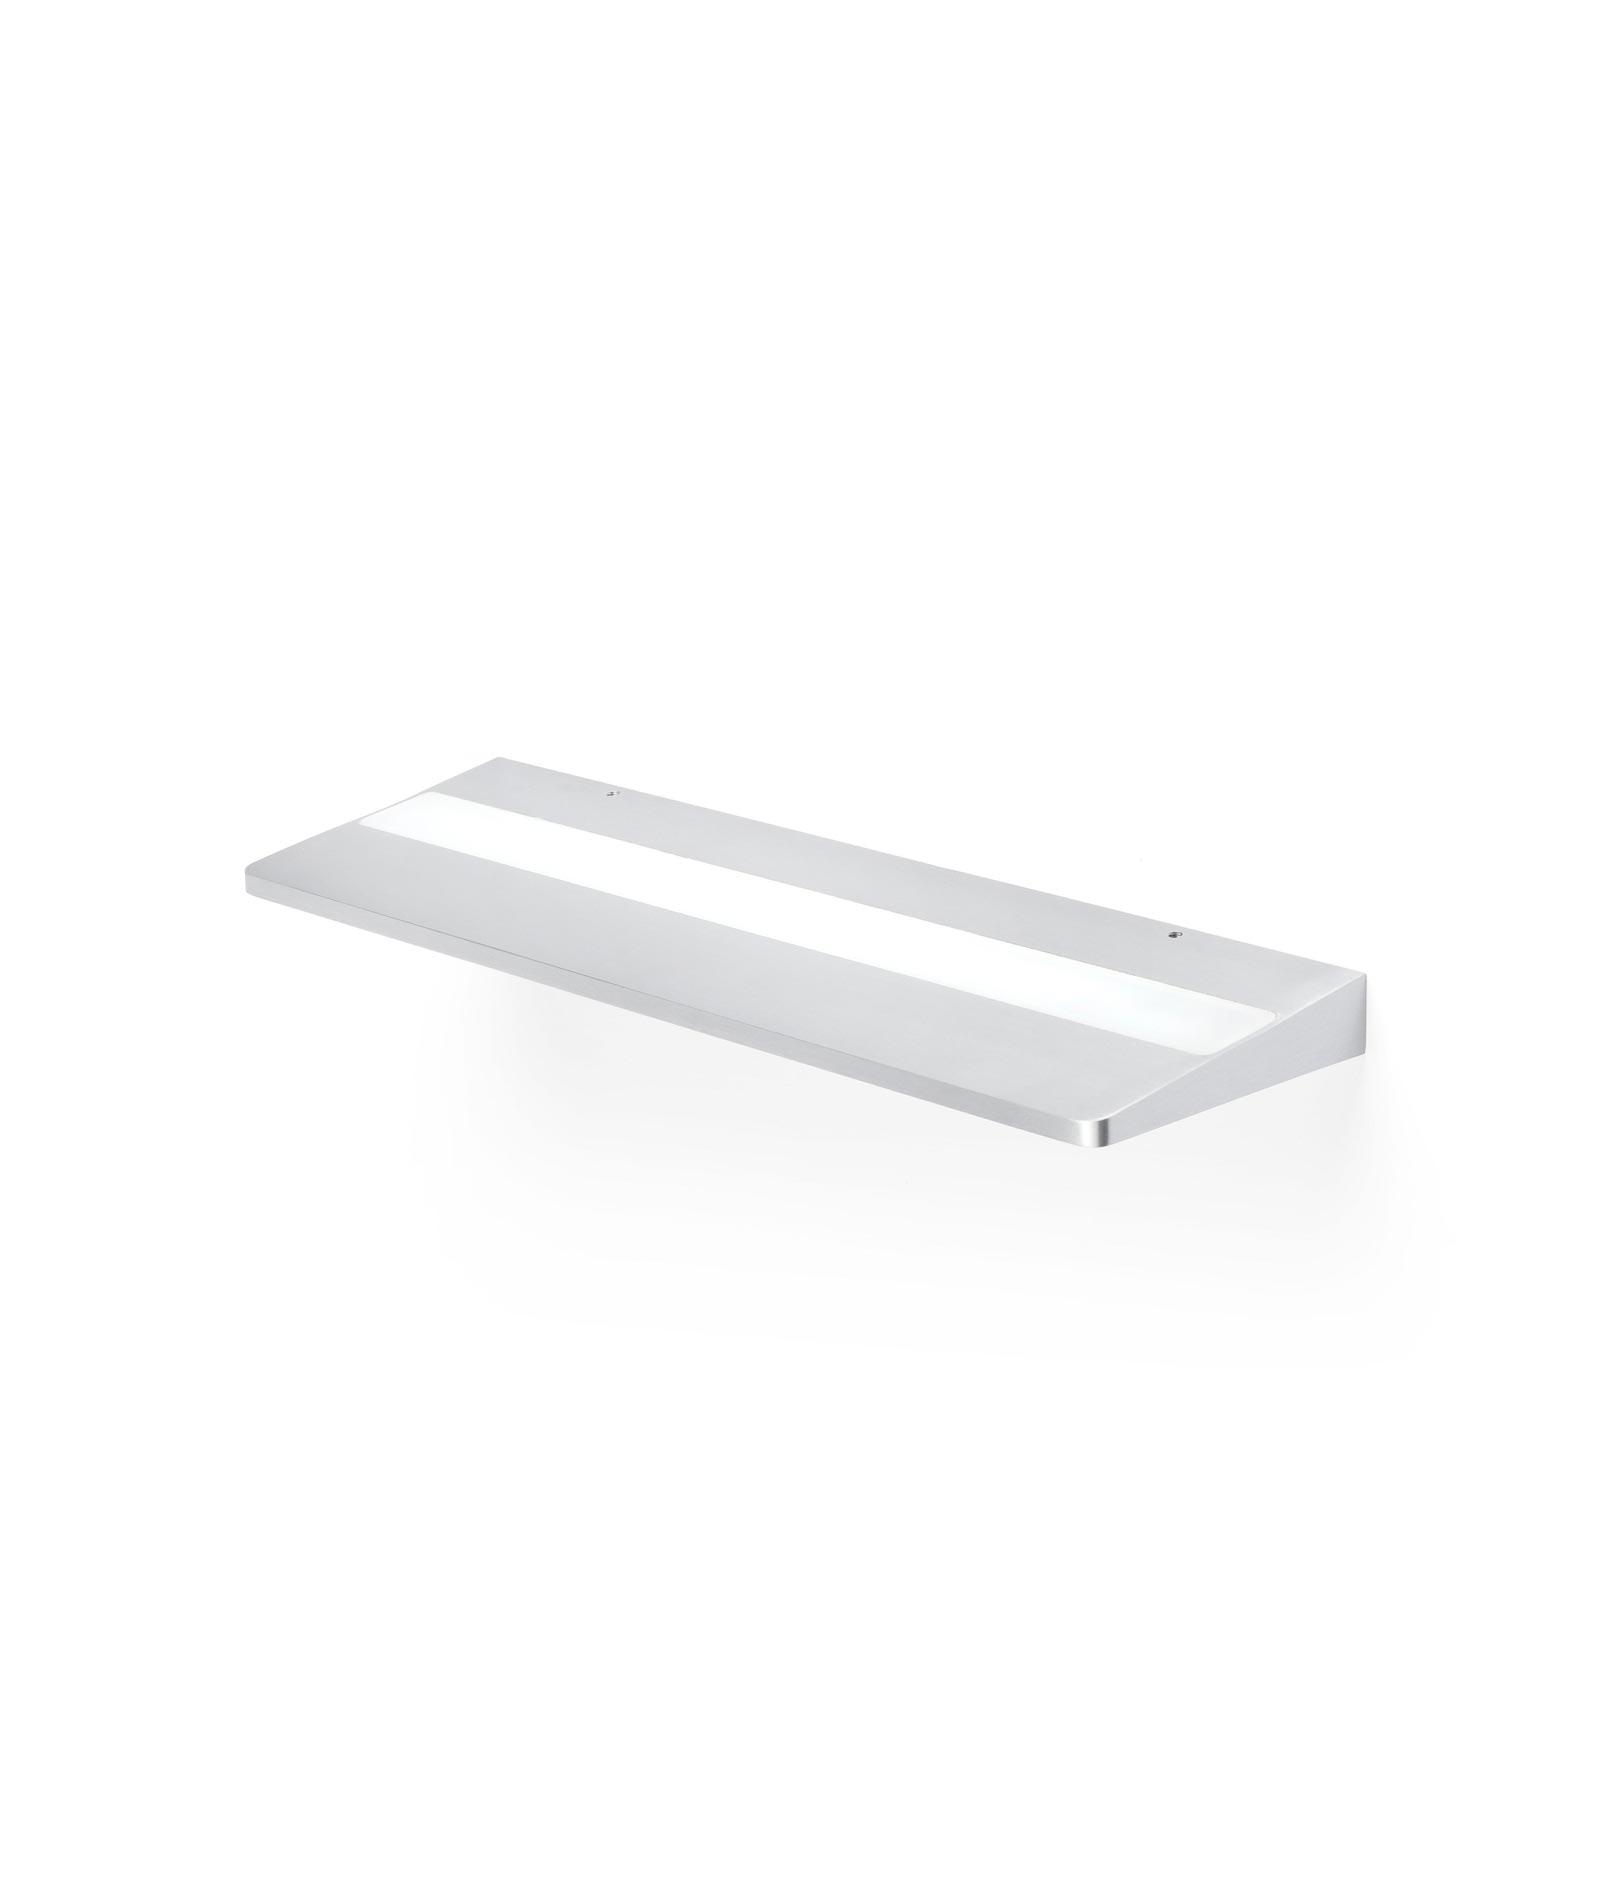 Aplique baño minimalista LINE LED